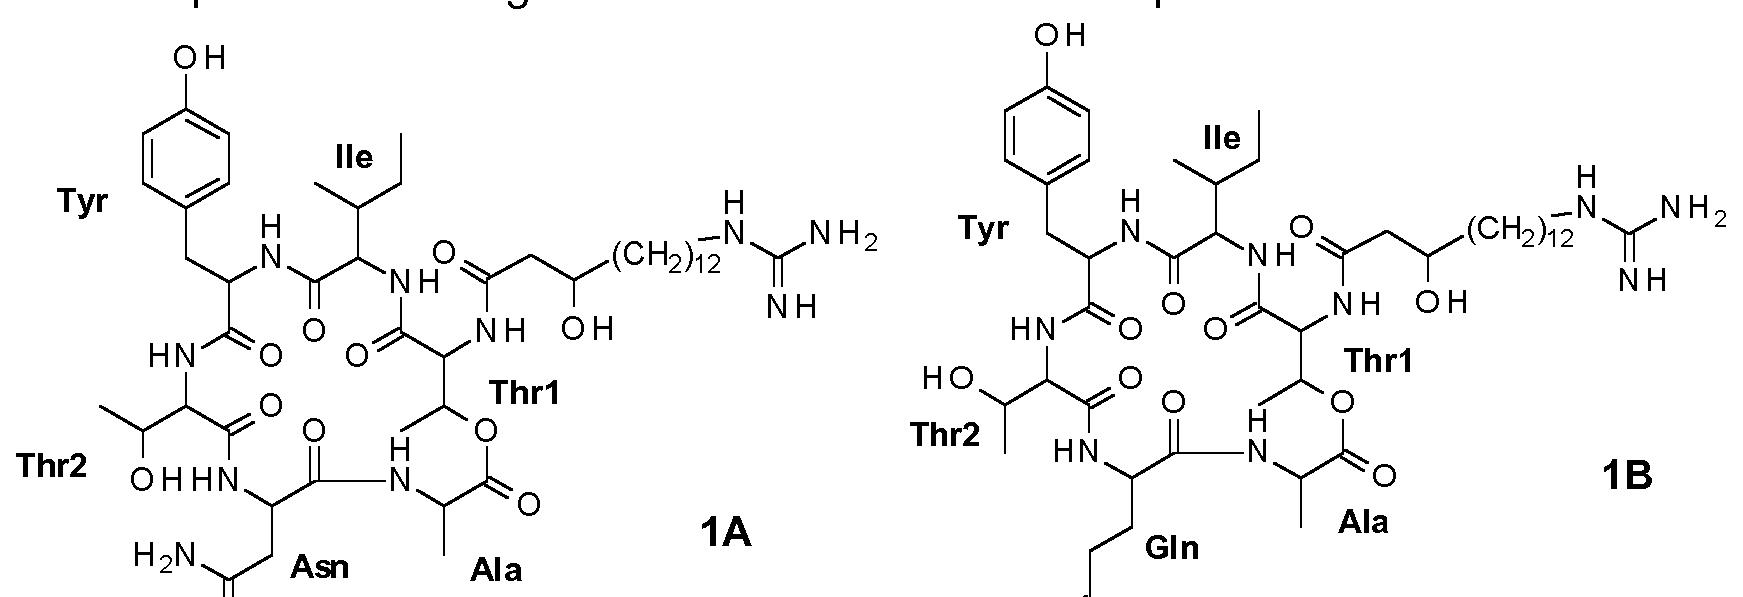 WO2016020371A1 - Antifungal paenibacillus strains, fusaricidin-type